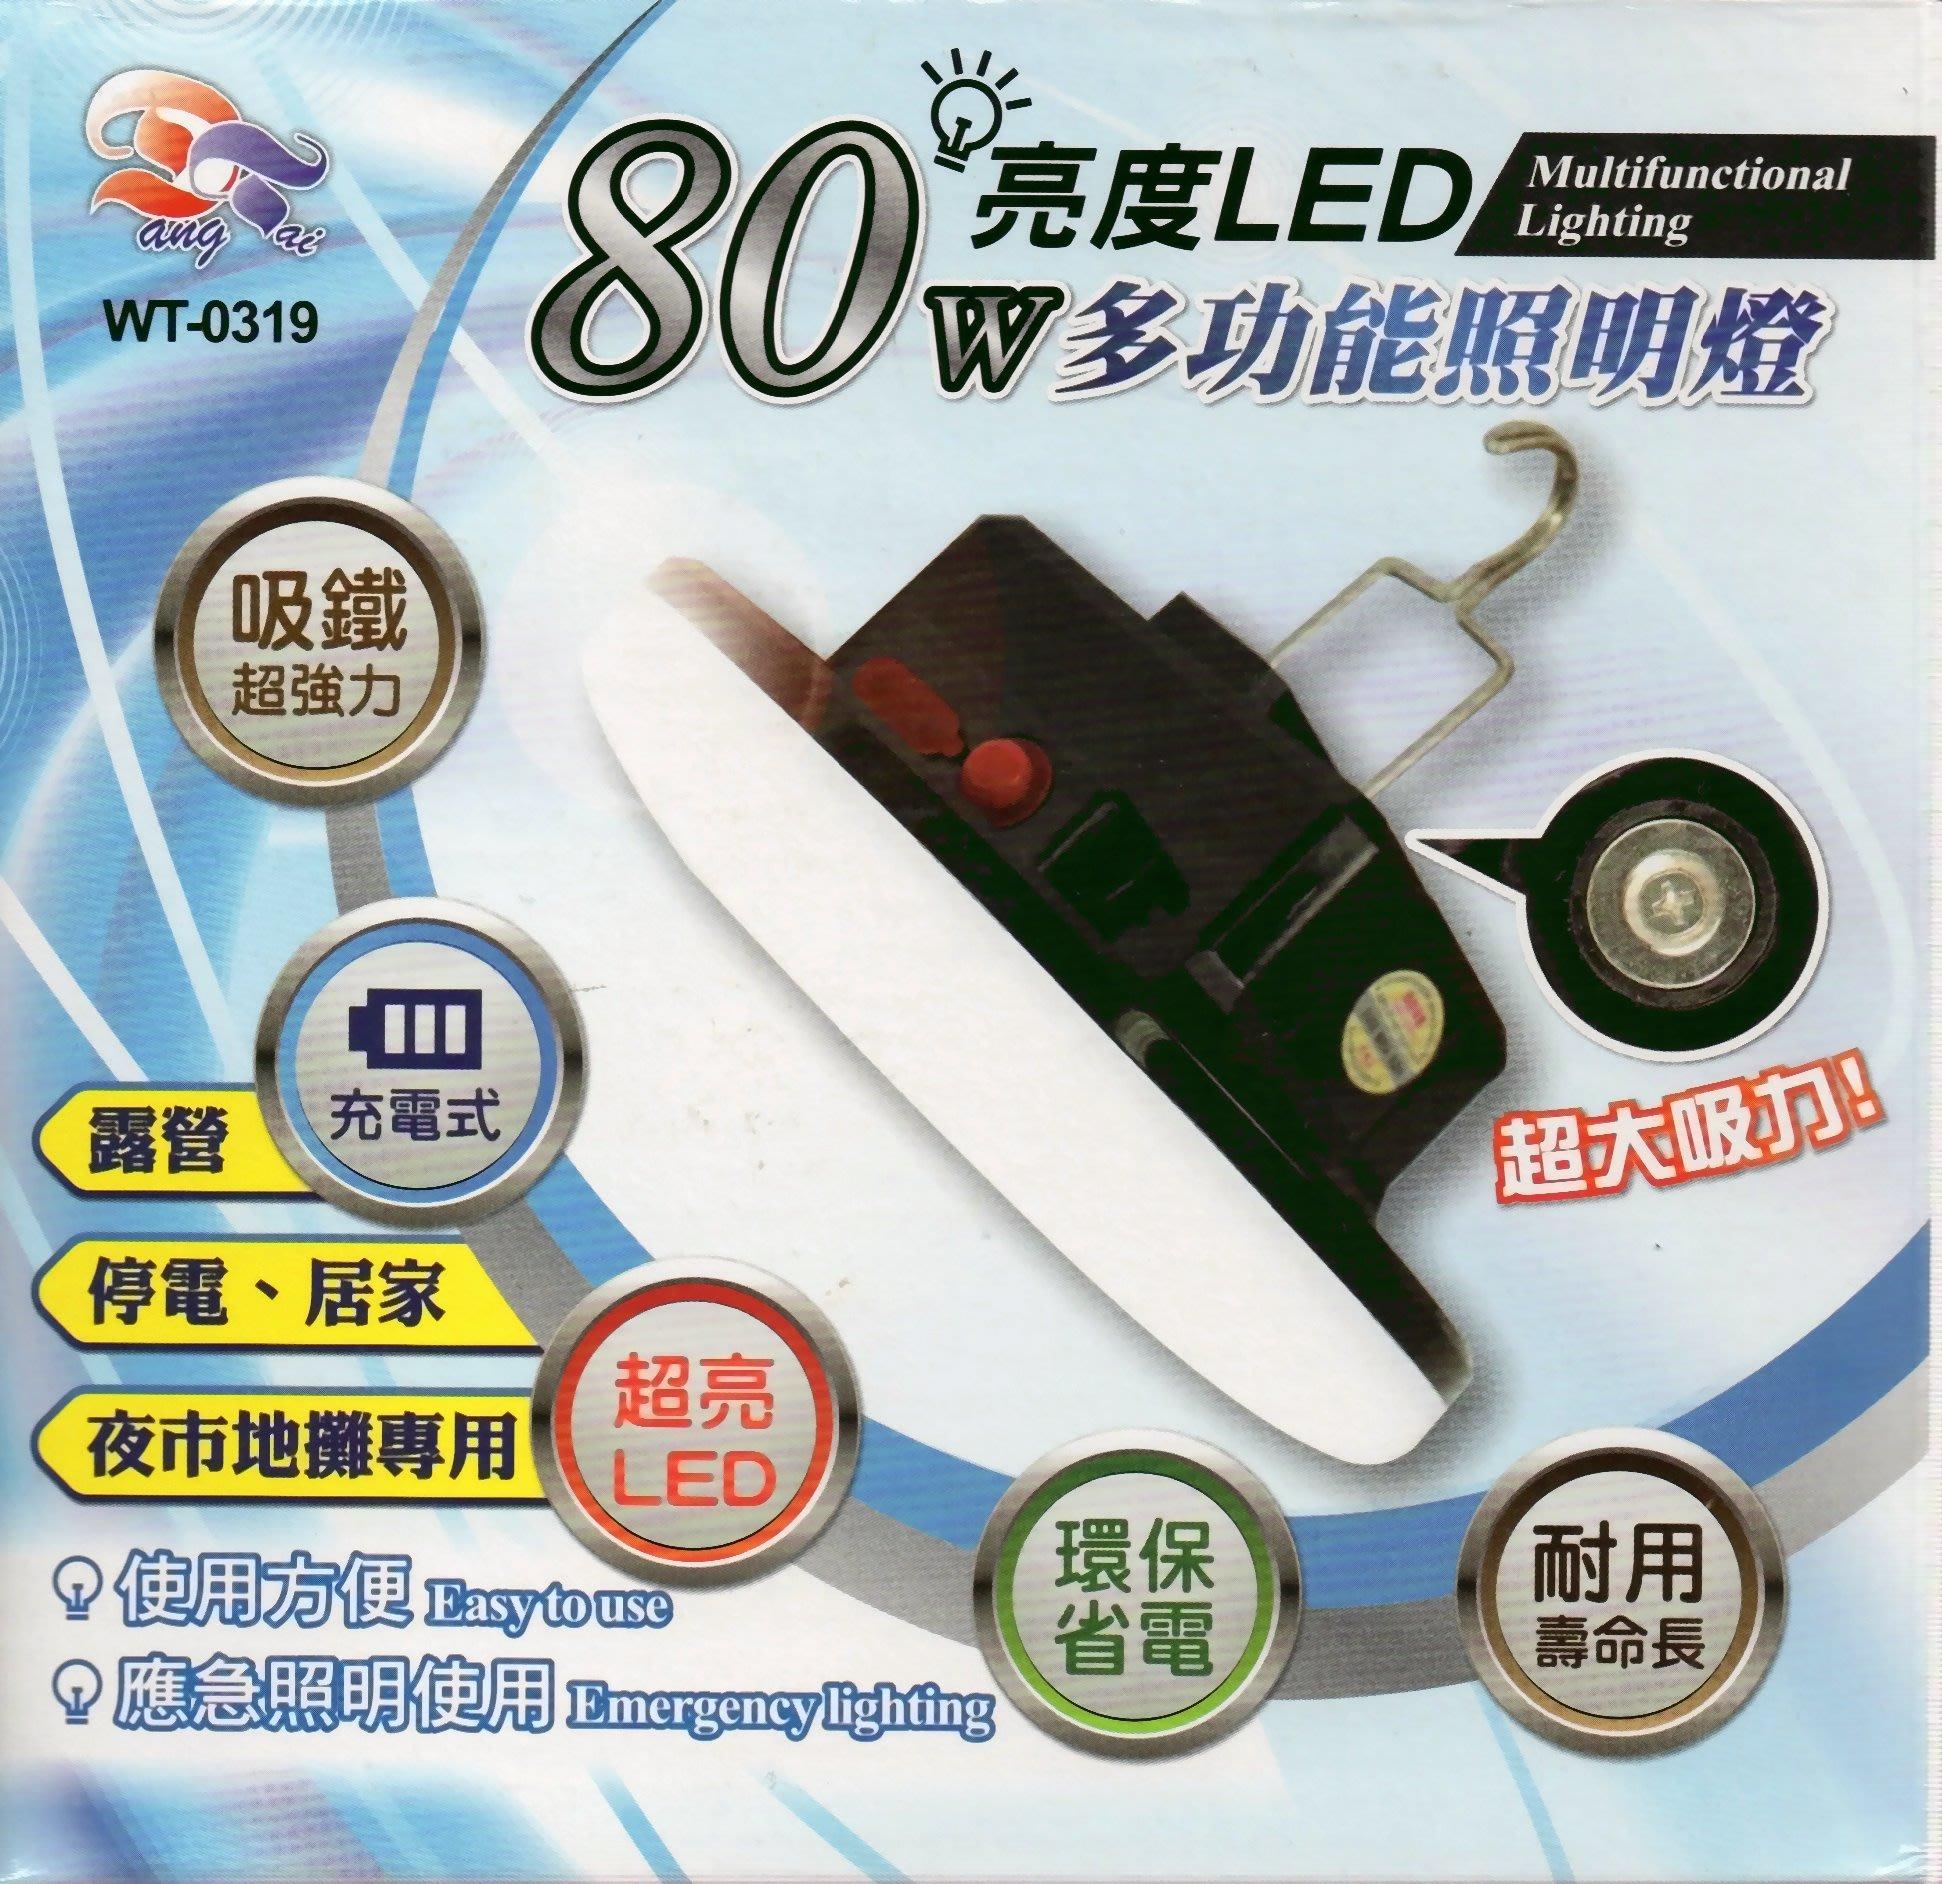 80W亮度LED多功能照明燈露營、停電、居家、夜市擺攤 超亮WT-0919